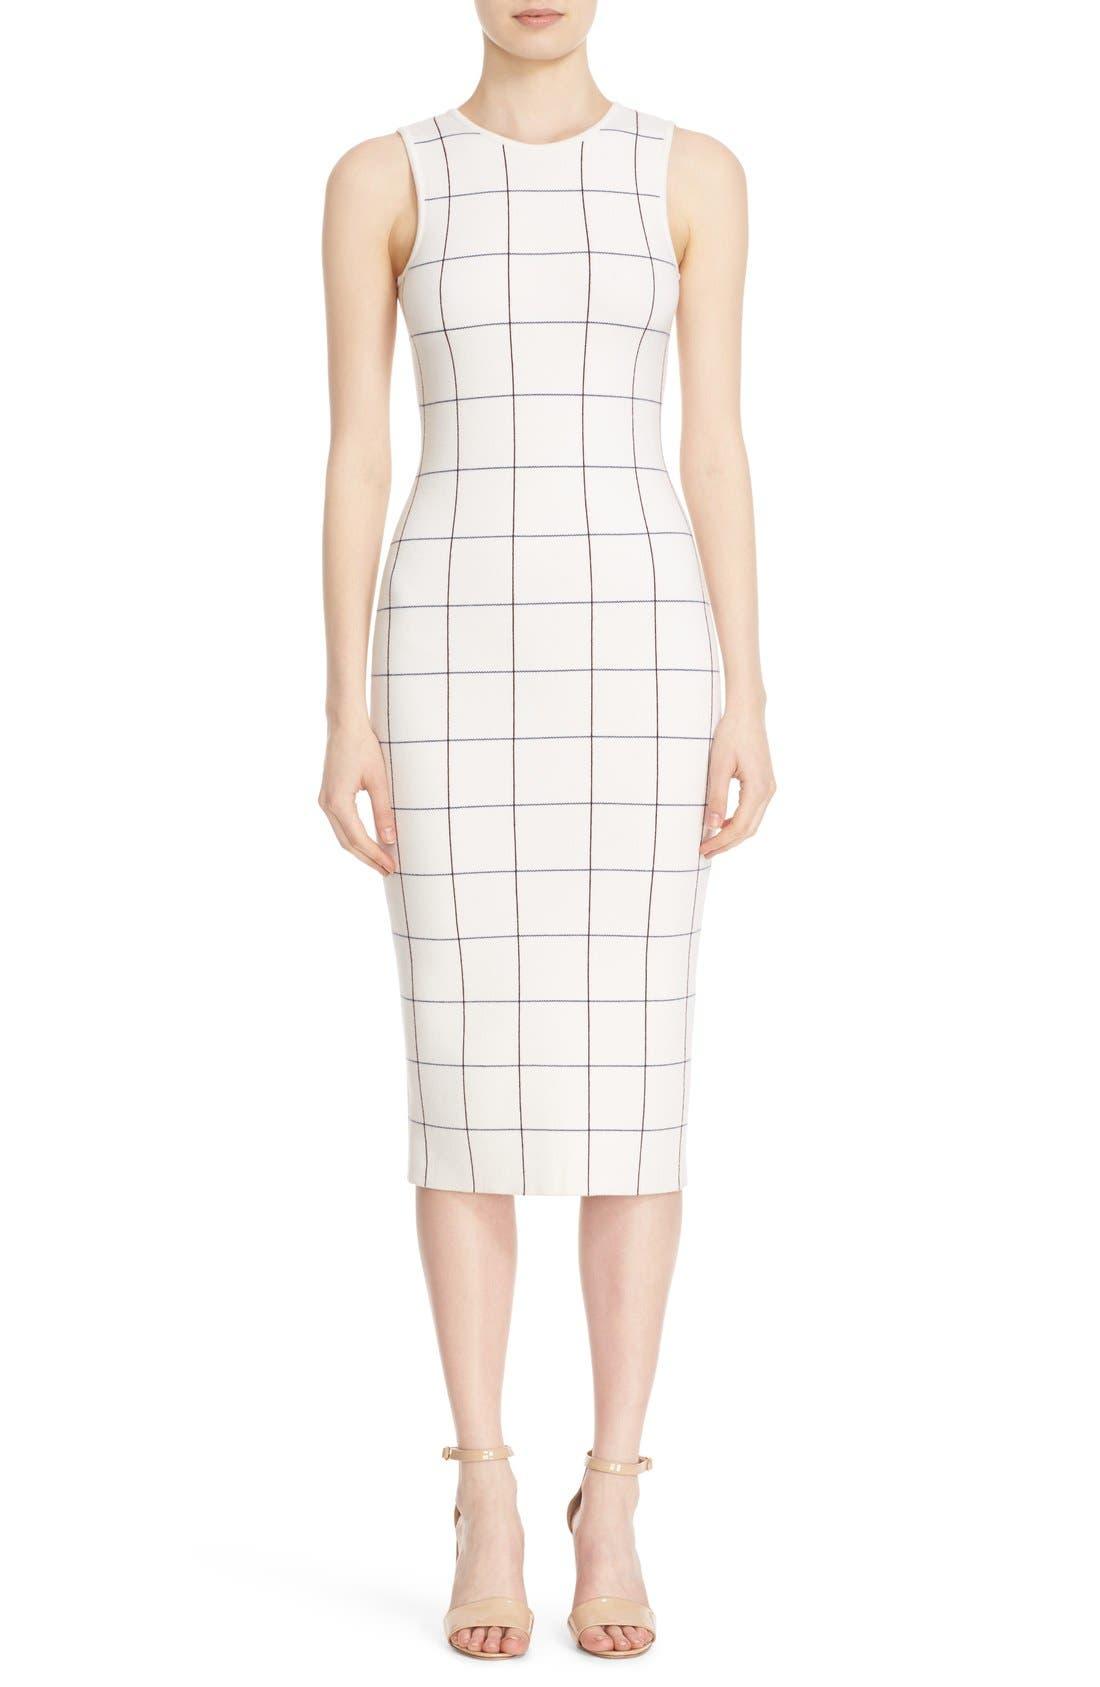 Victoria Beckham Intarsia Check Sheath Dress,                         Main,                         color, 100